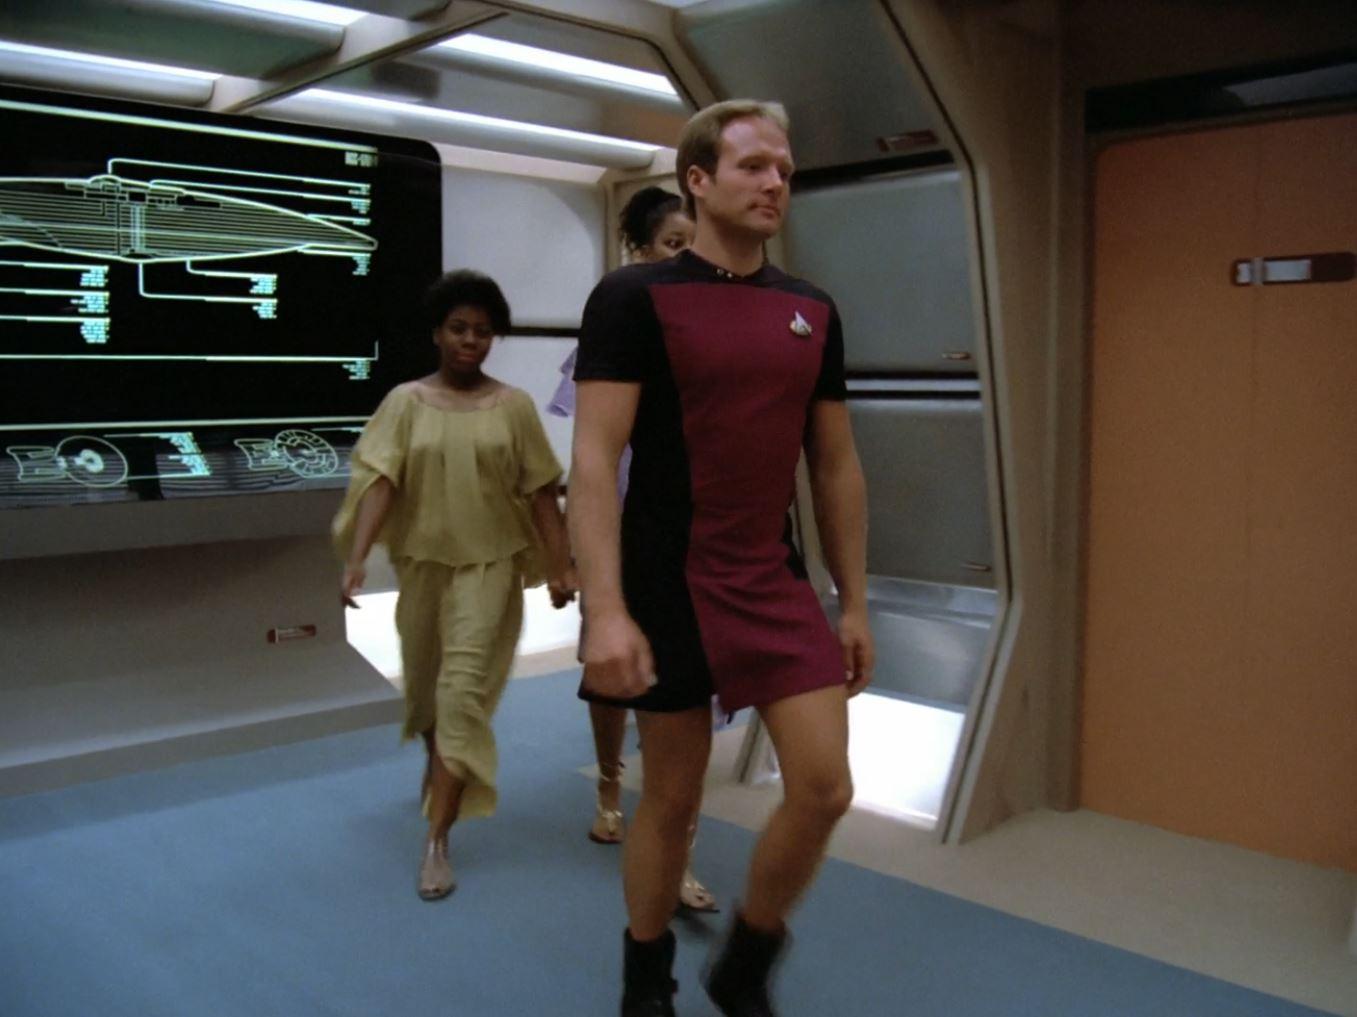 Star Trek The Next Generation A gentle Encounter Before Farpoint Man in Skirt